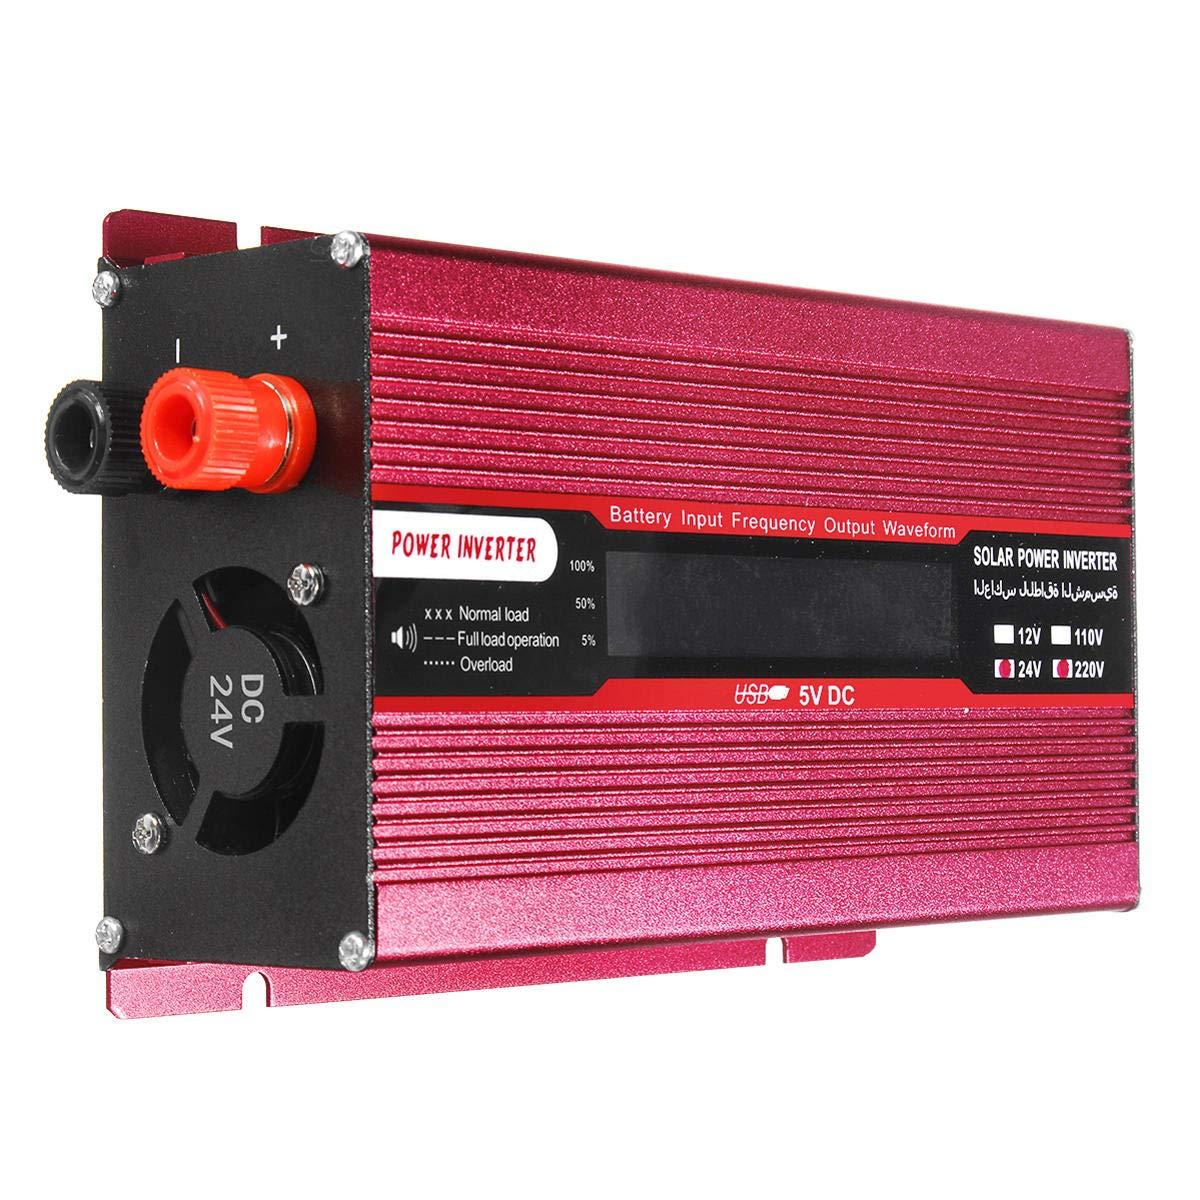 Anddoa 1000W DC 12V/24V to AC 220V/110V Solar Power Inverter Modified Sine Wave LCD Voltage Display - 12V-110V